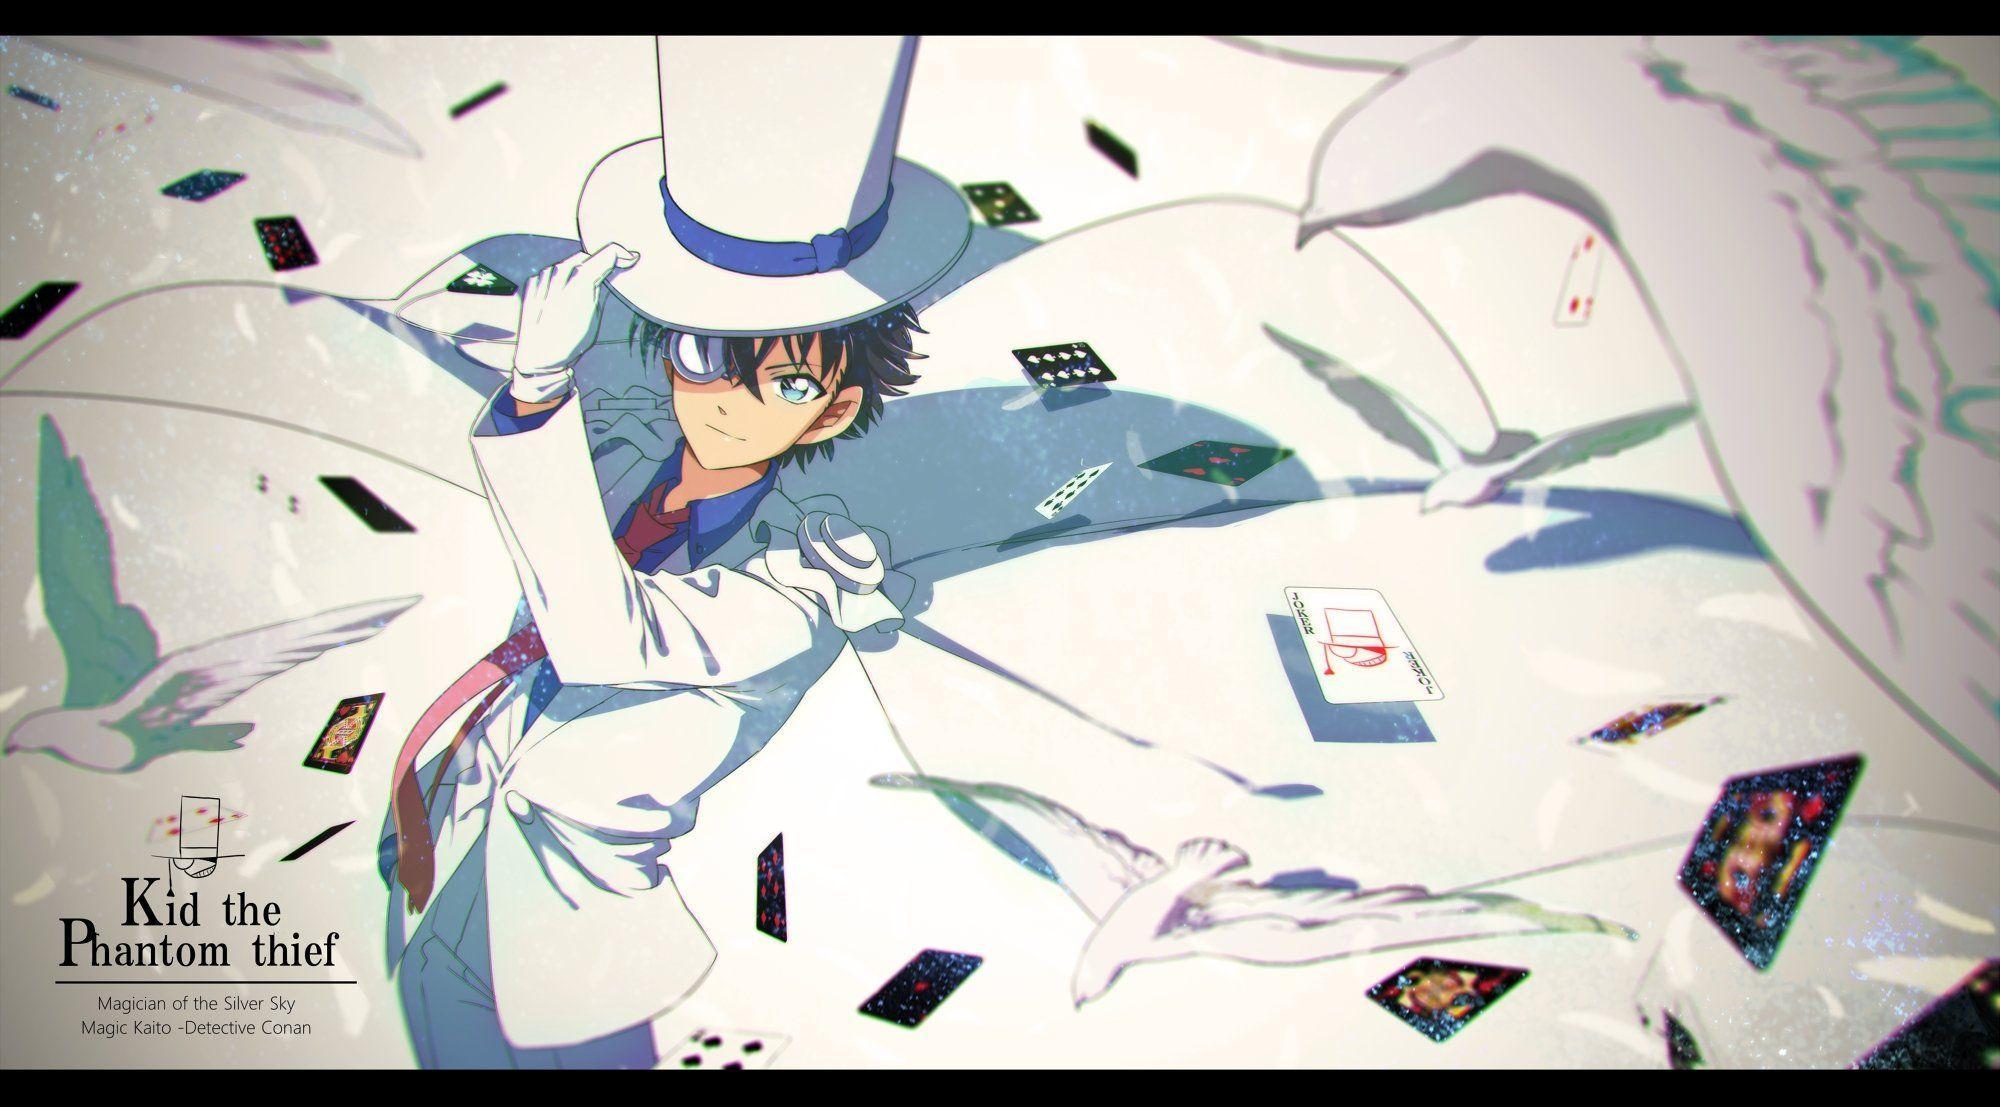 Magic Kaito Wallpaper - WallpaperSafari